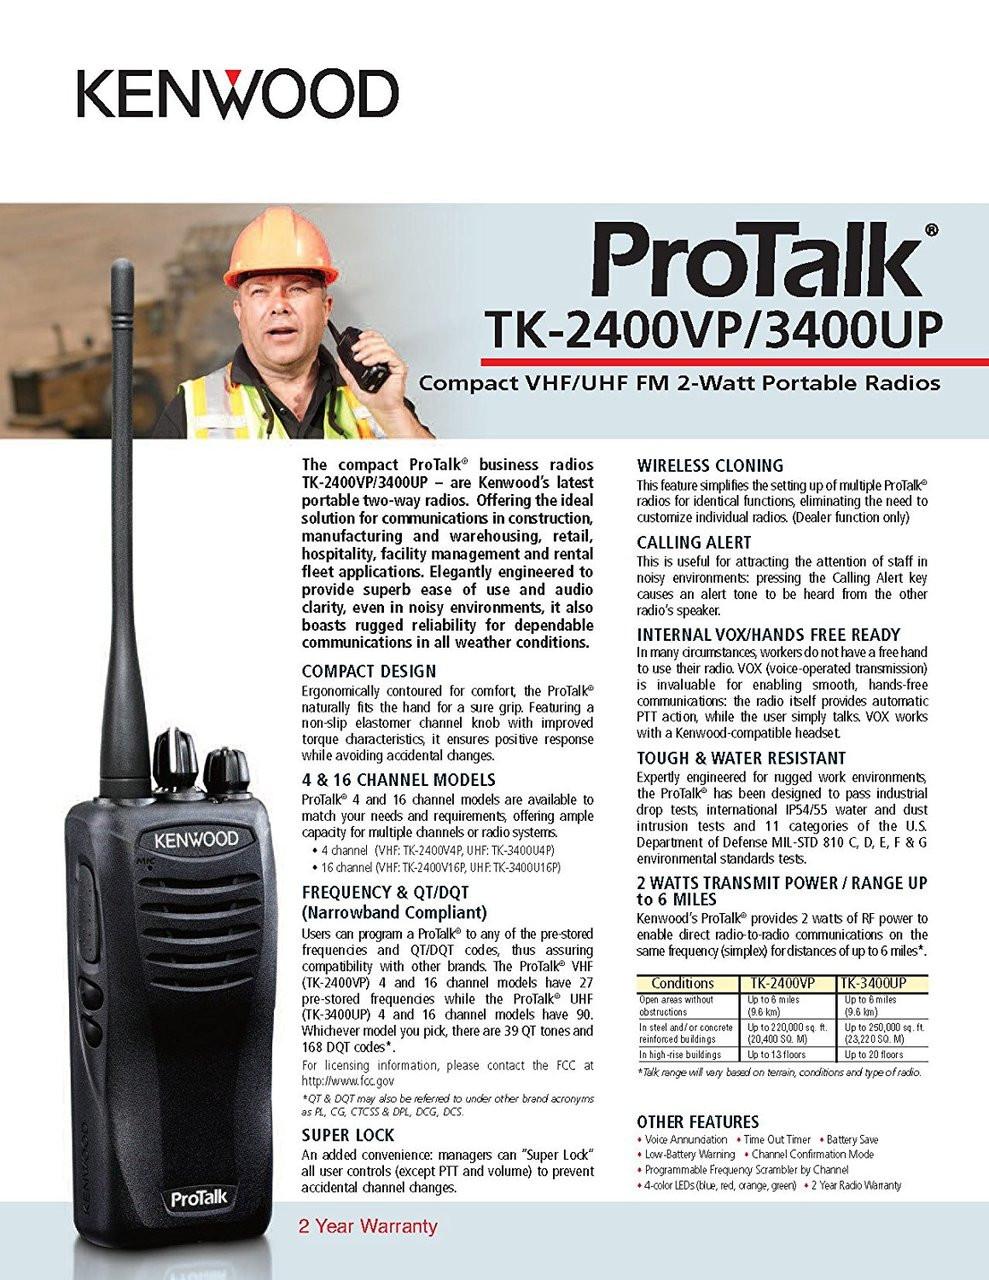 Kenwood ProTalk TK-3402U16P Spec Sheet Page 1 of 2